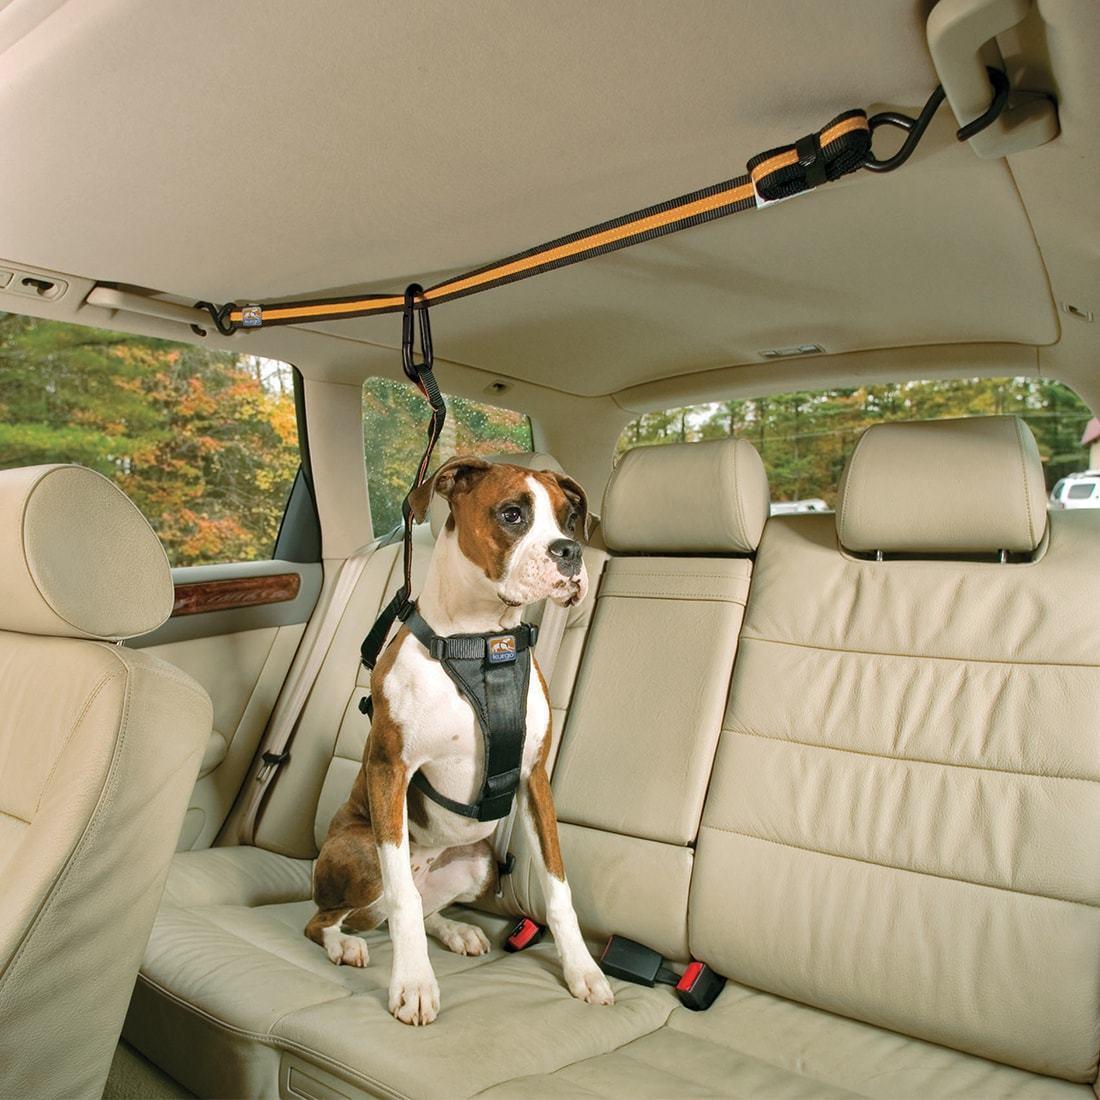 kg-dog-car-zip-line-restraint-4.jpg